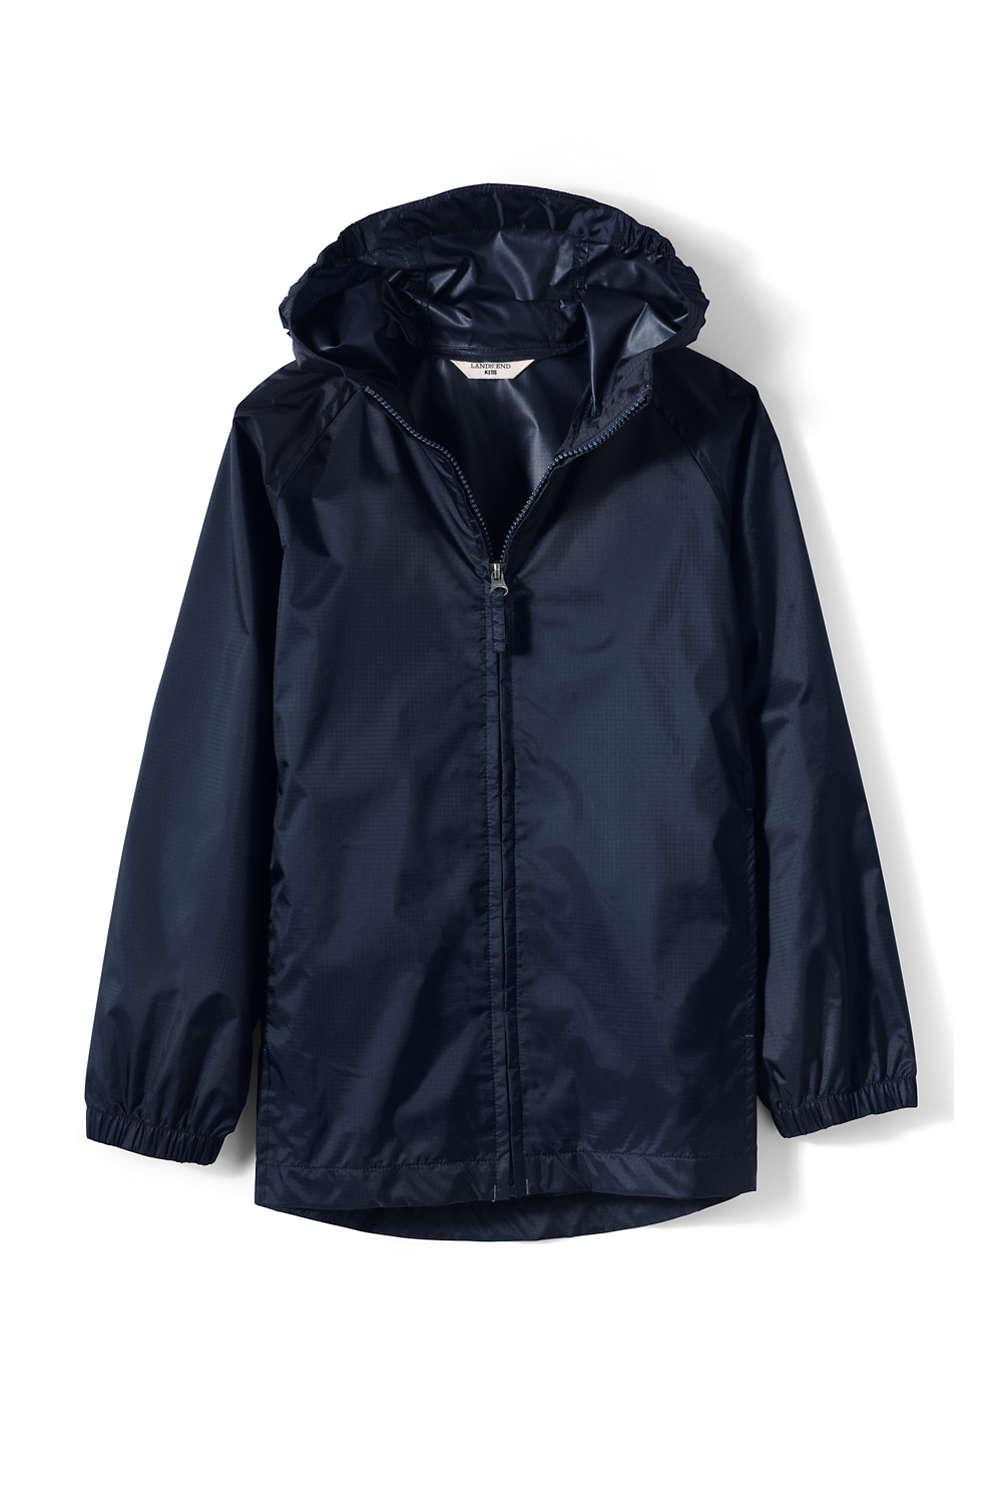 5d5e5a60207b2 School Uniform Packable Rain Jacket from Lands' End